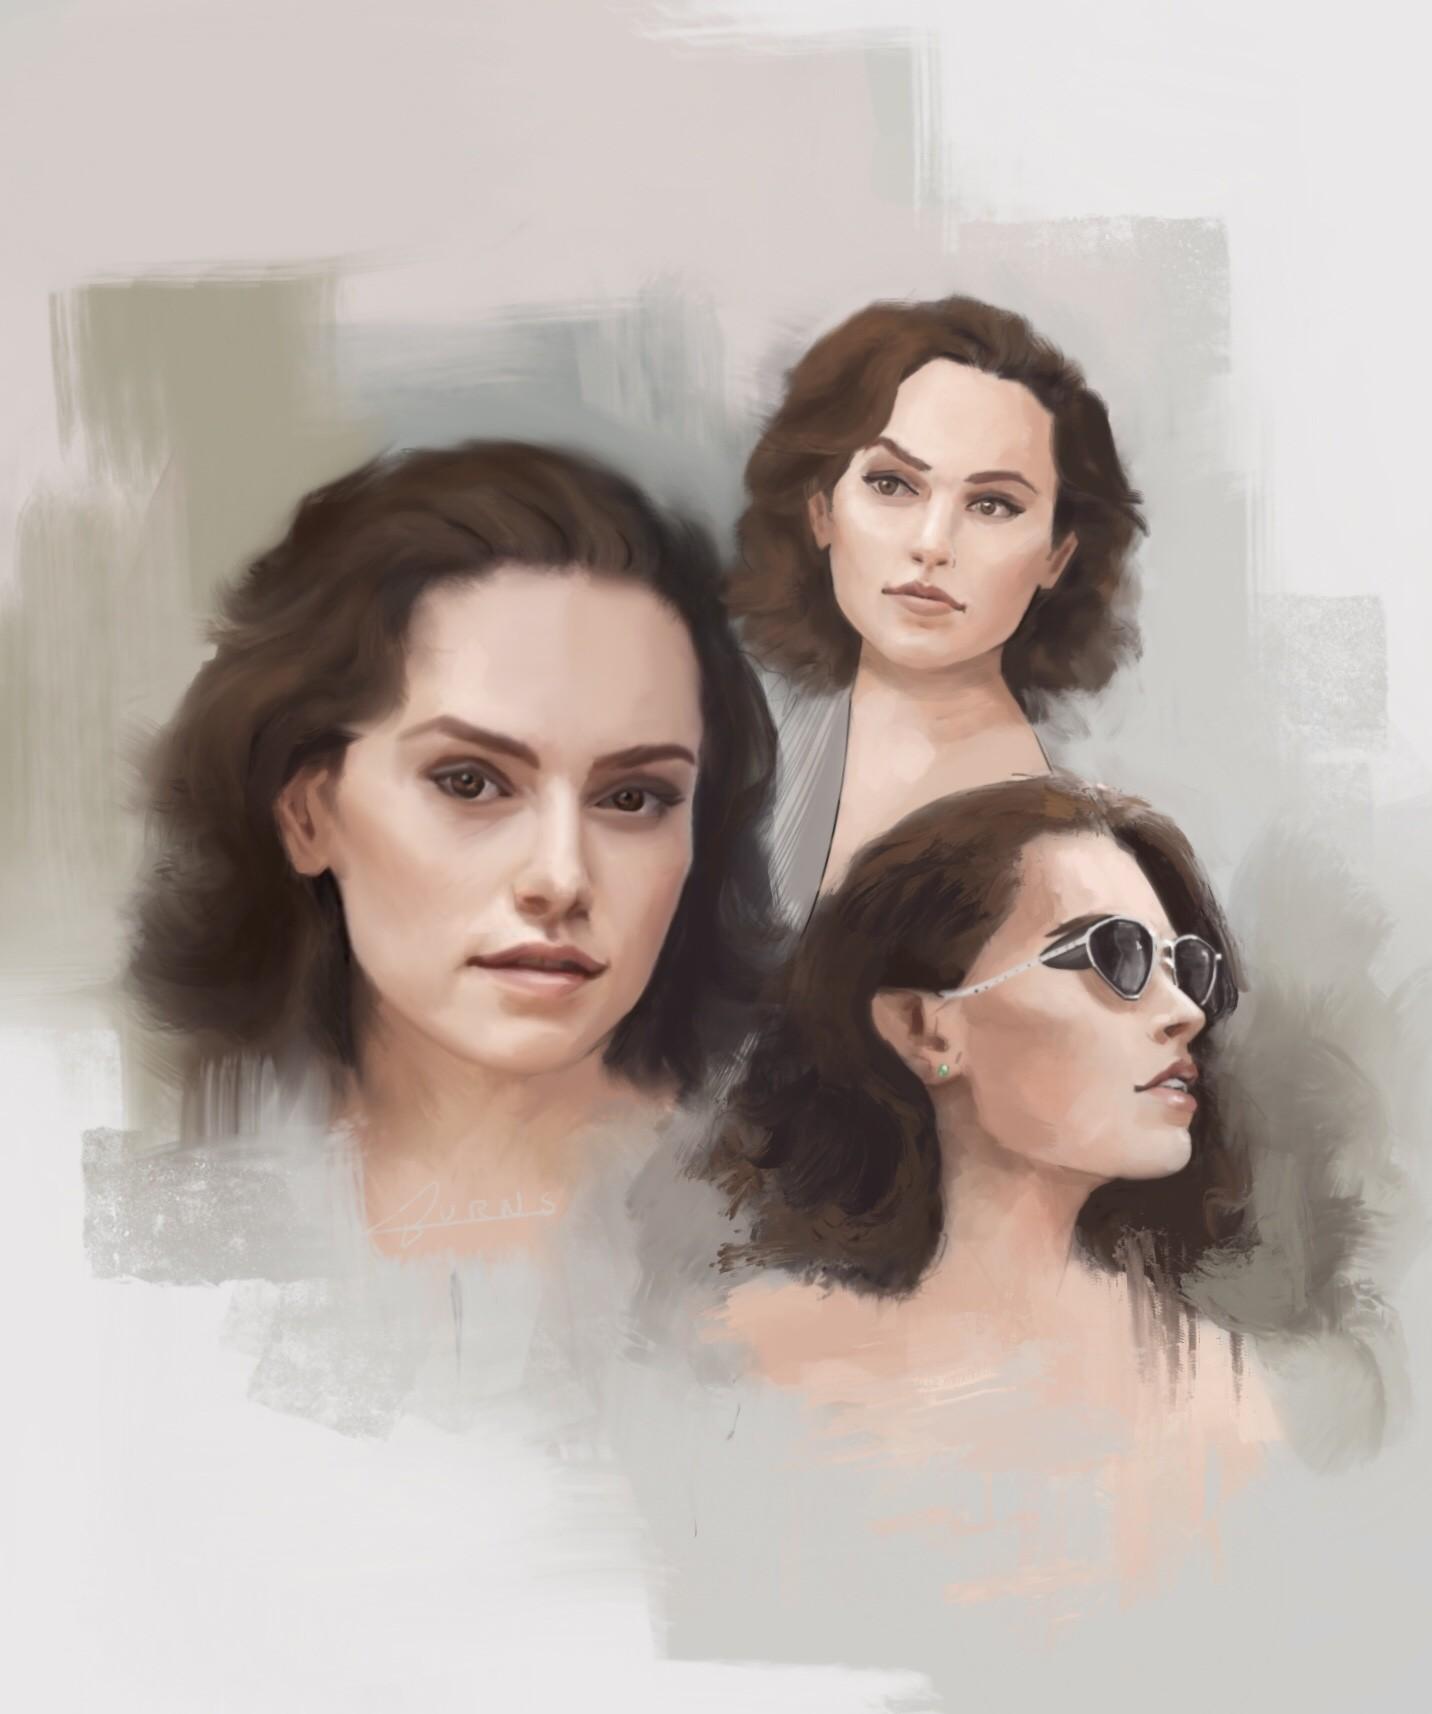 Daisy Ridley studies